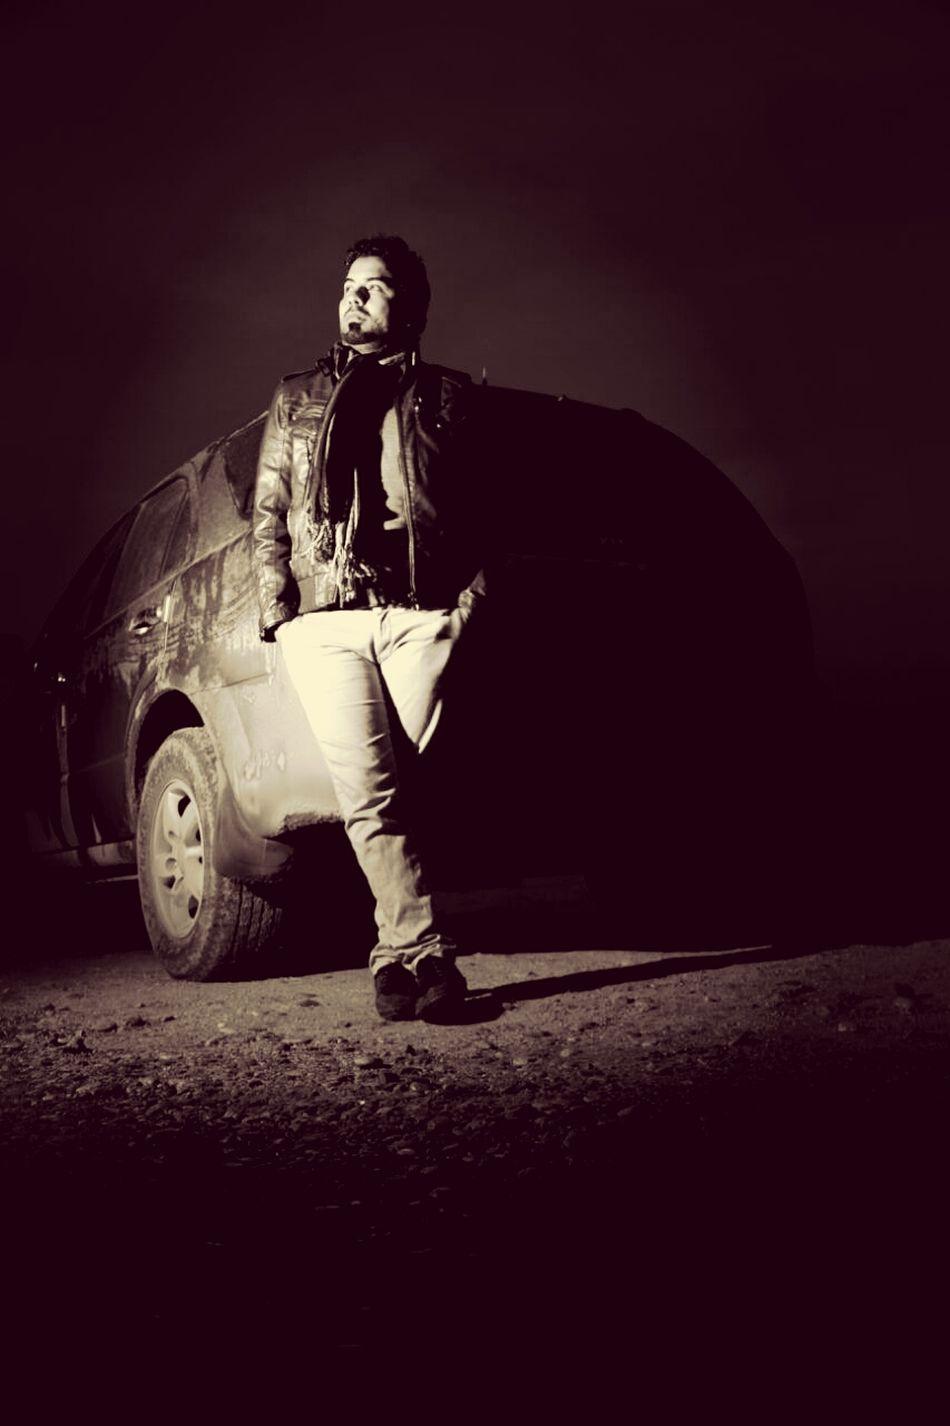 Gazwan_munim عاشرتك عمر.... يالنص شهر مابيك